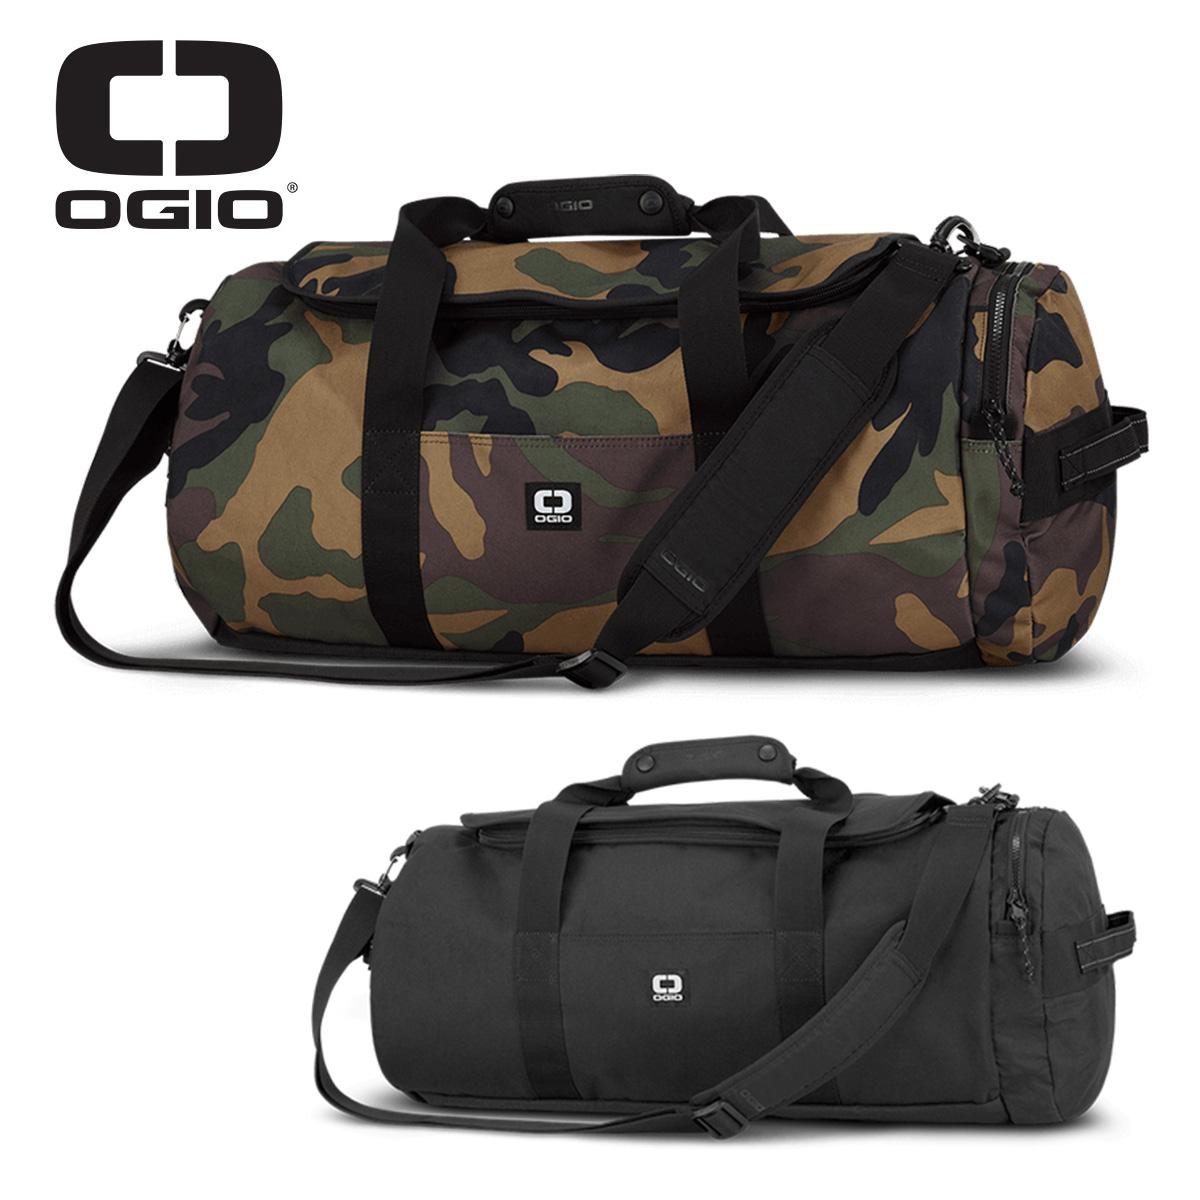 OGIO(オジオ)日本正規品 OGIO ALPHA Recon 335 Duffel 19 JV ダッフルバッグ 2020新製品 【あす楽対応】